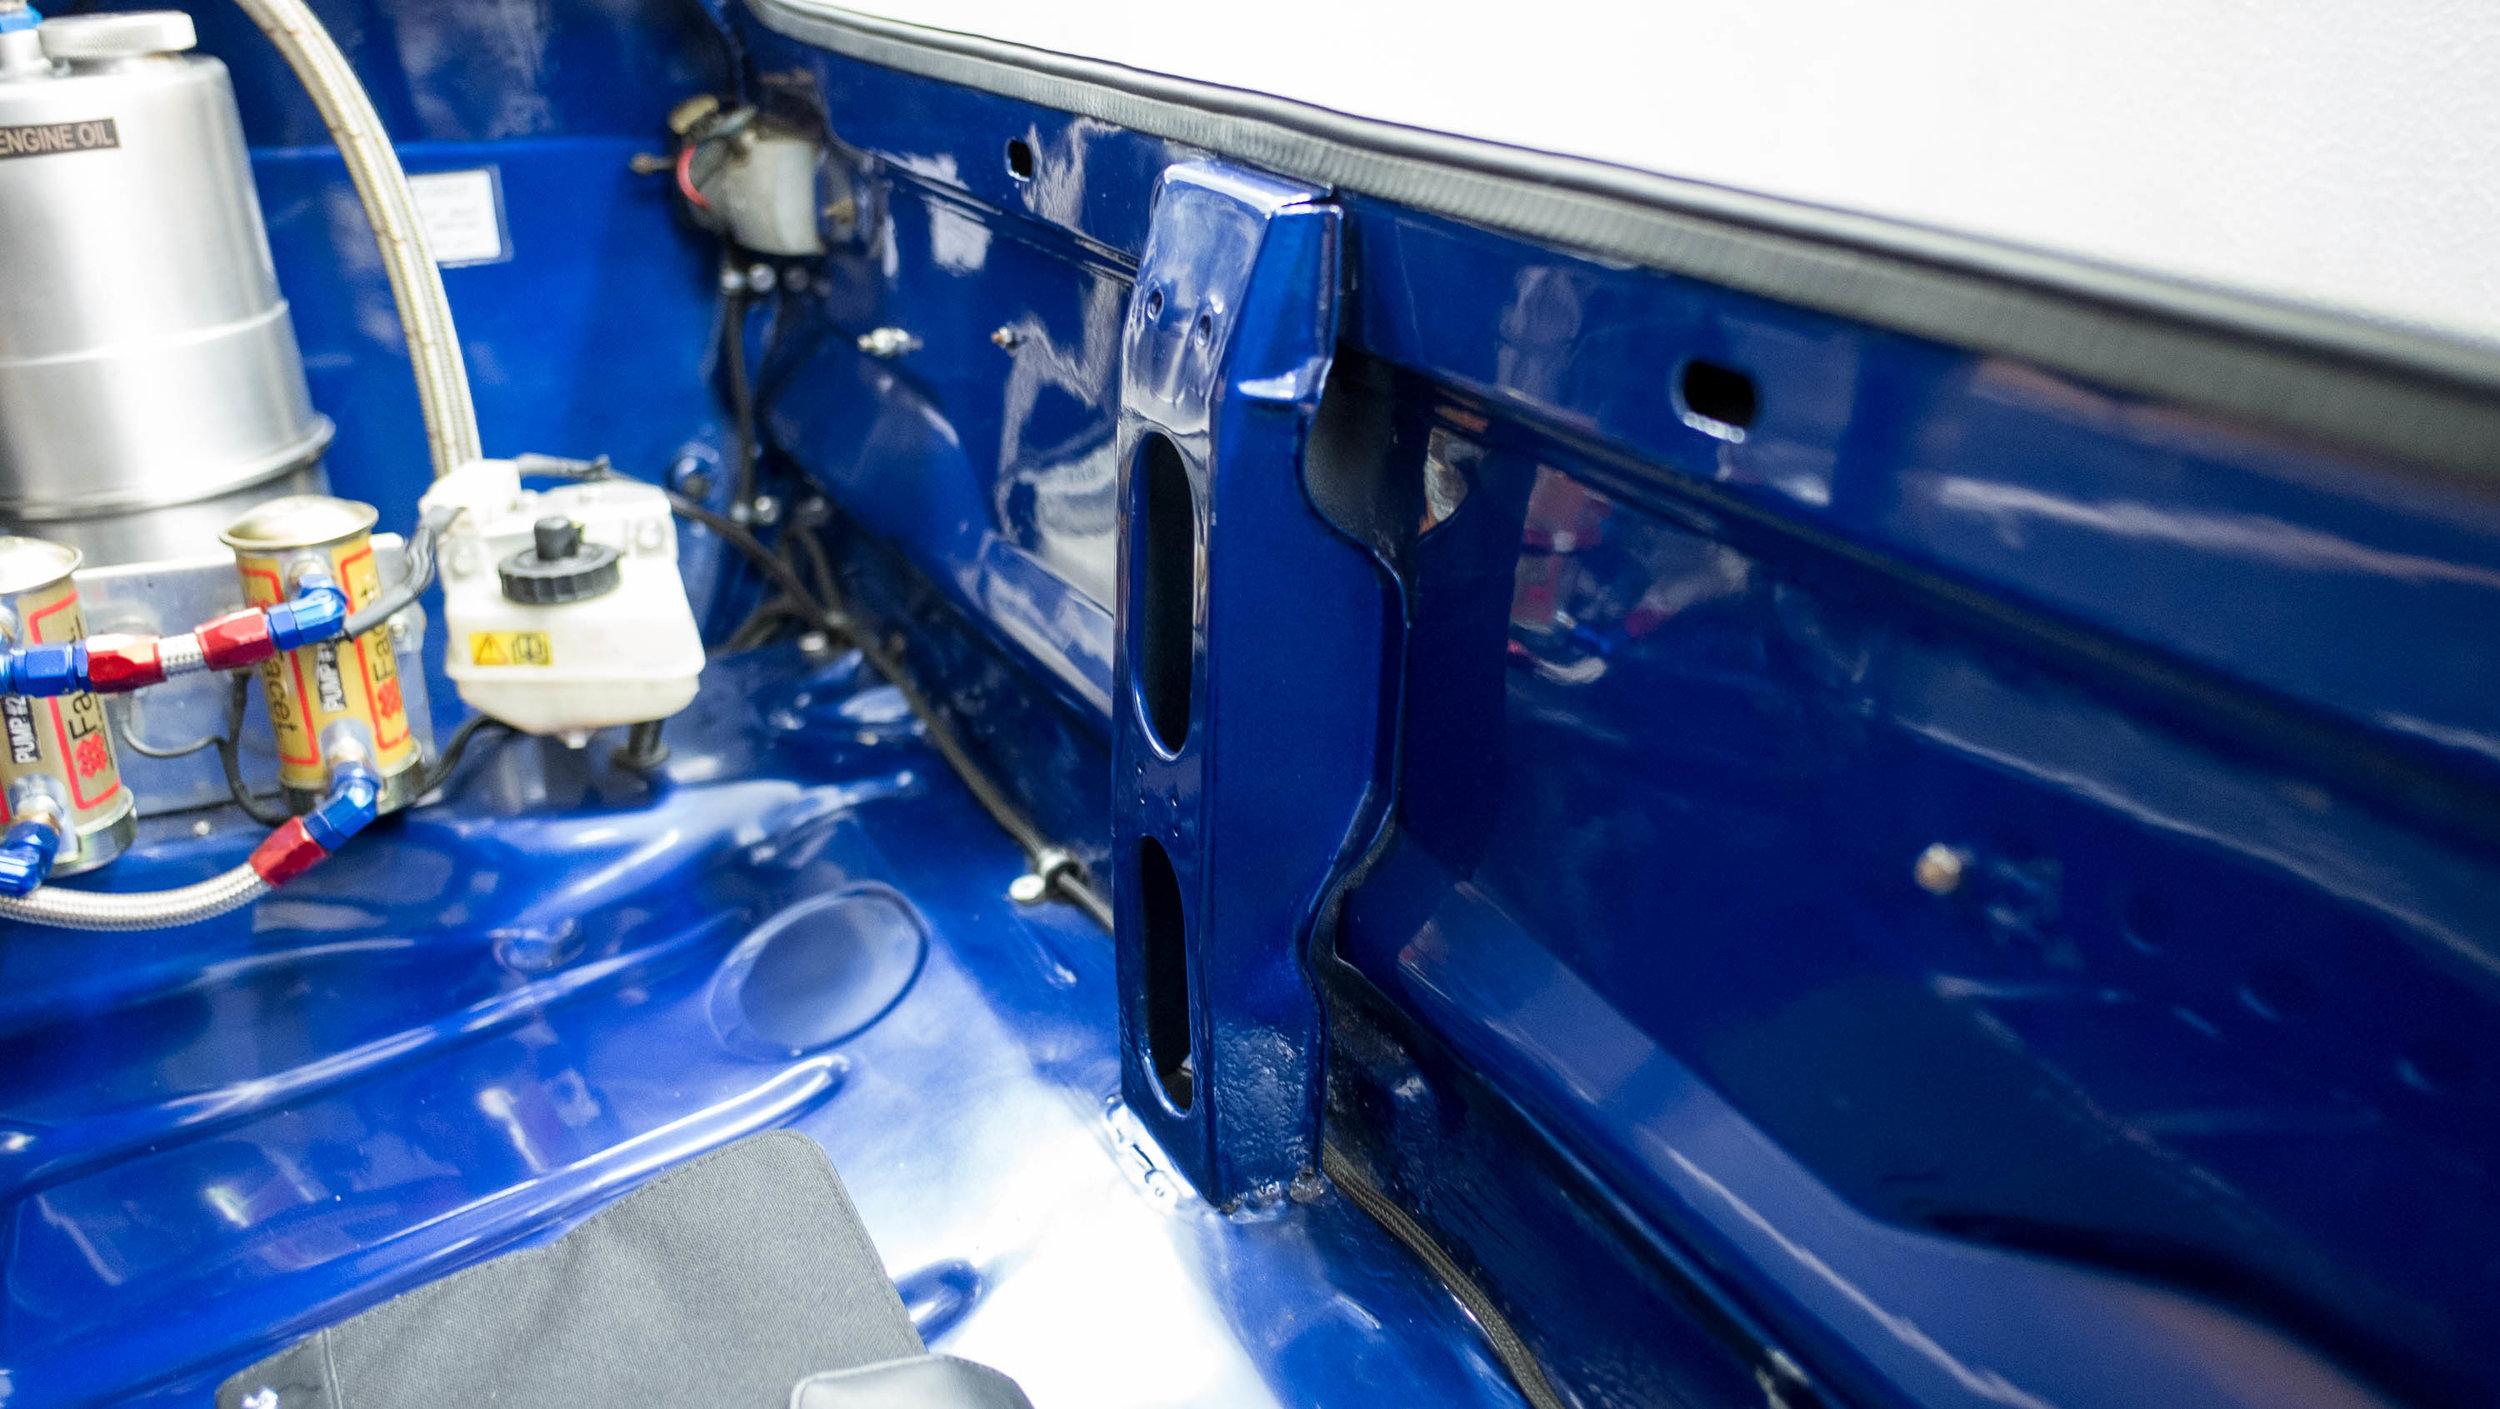 coolnvintage Ford Escort MKI (61 of 87).jpg